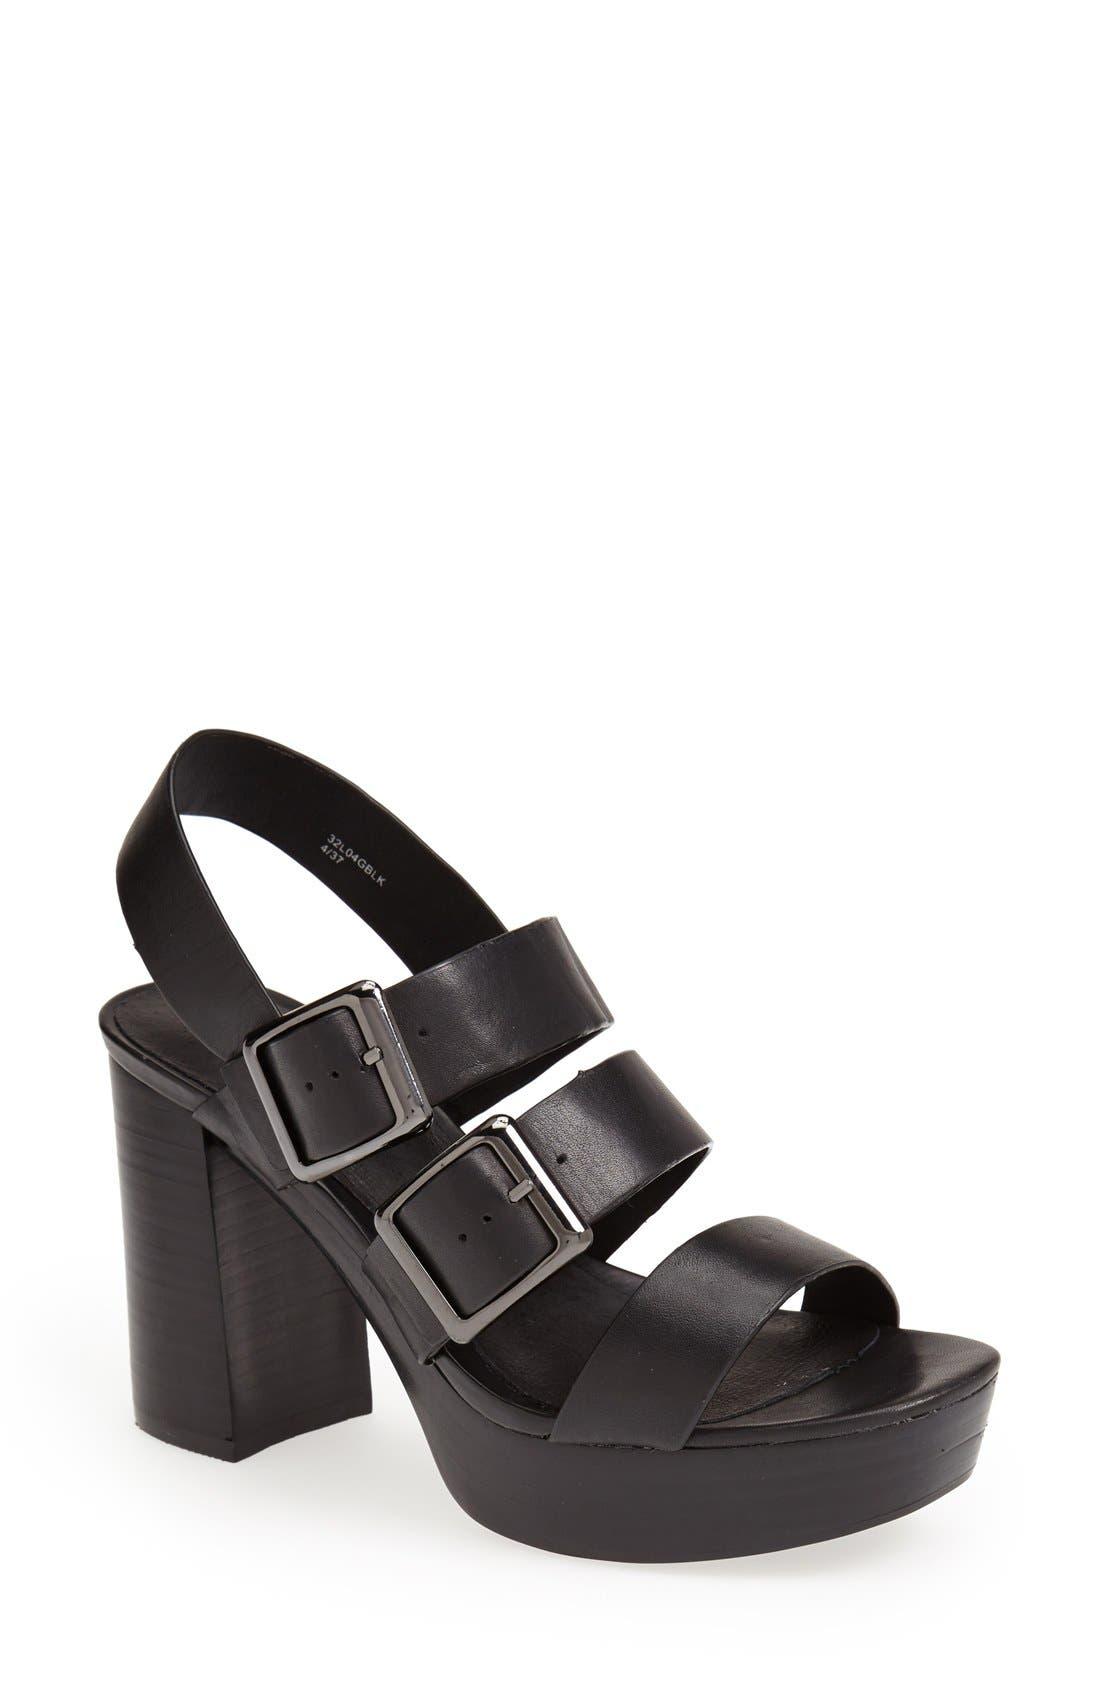 Alternate Image 1 Selected - Topshop 'Lawless' Platform Sandal (Women)